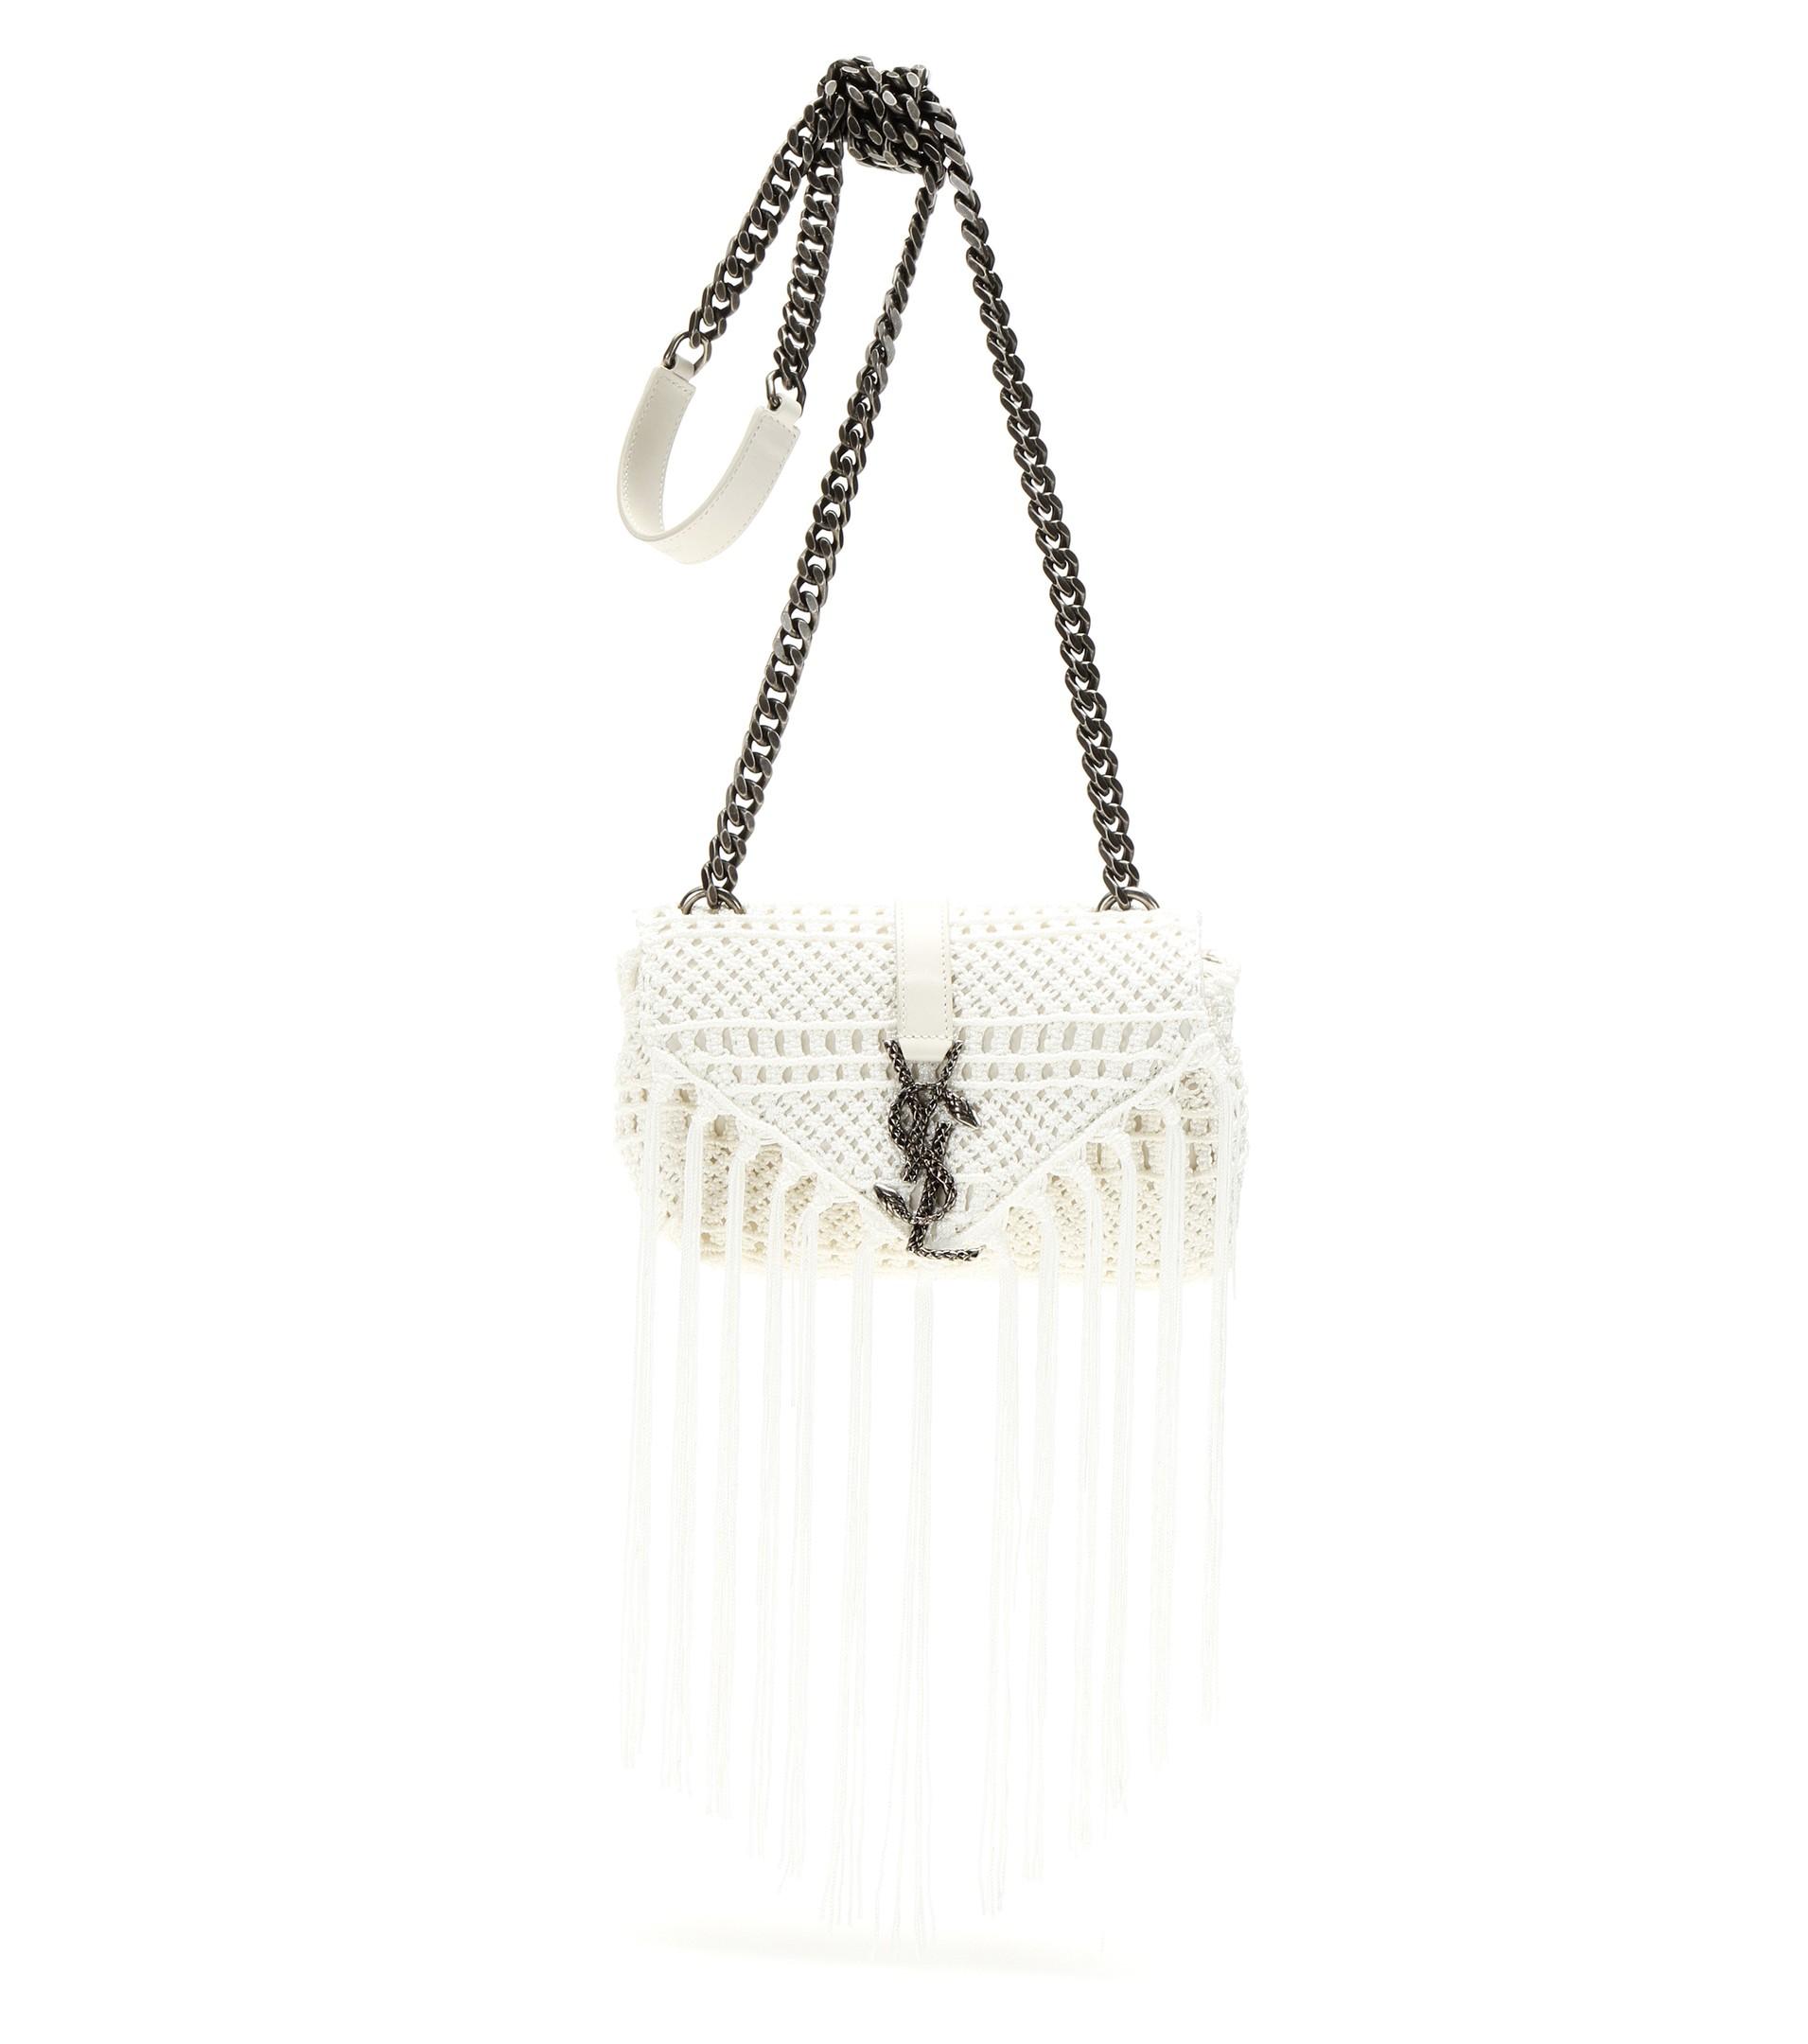 Lyst - Saint Laurent Monogram Baby Crochet-knit Shoulder Bag in Natural f477be201e00c